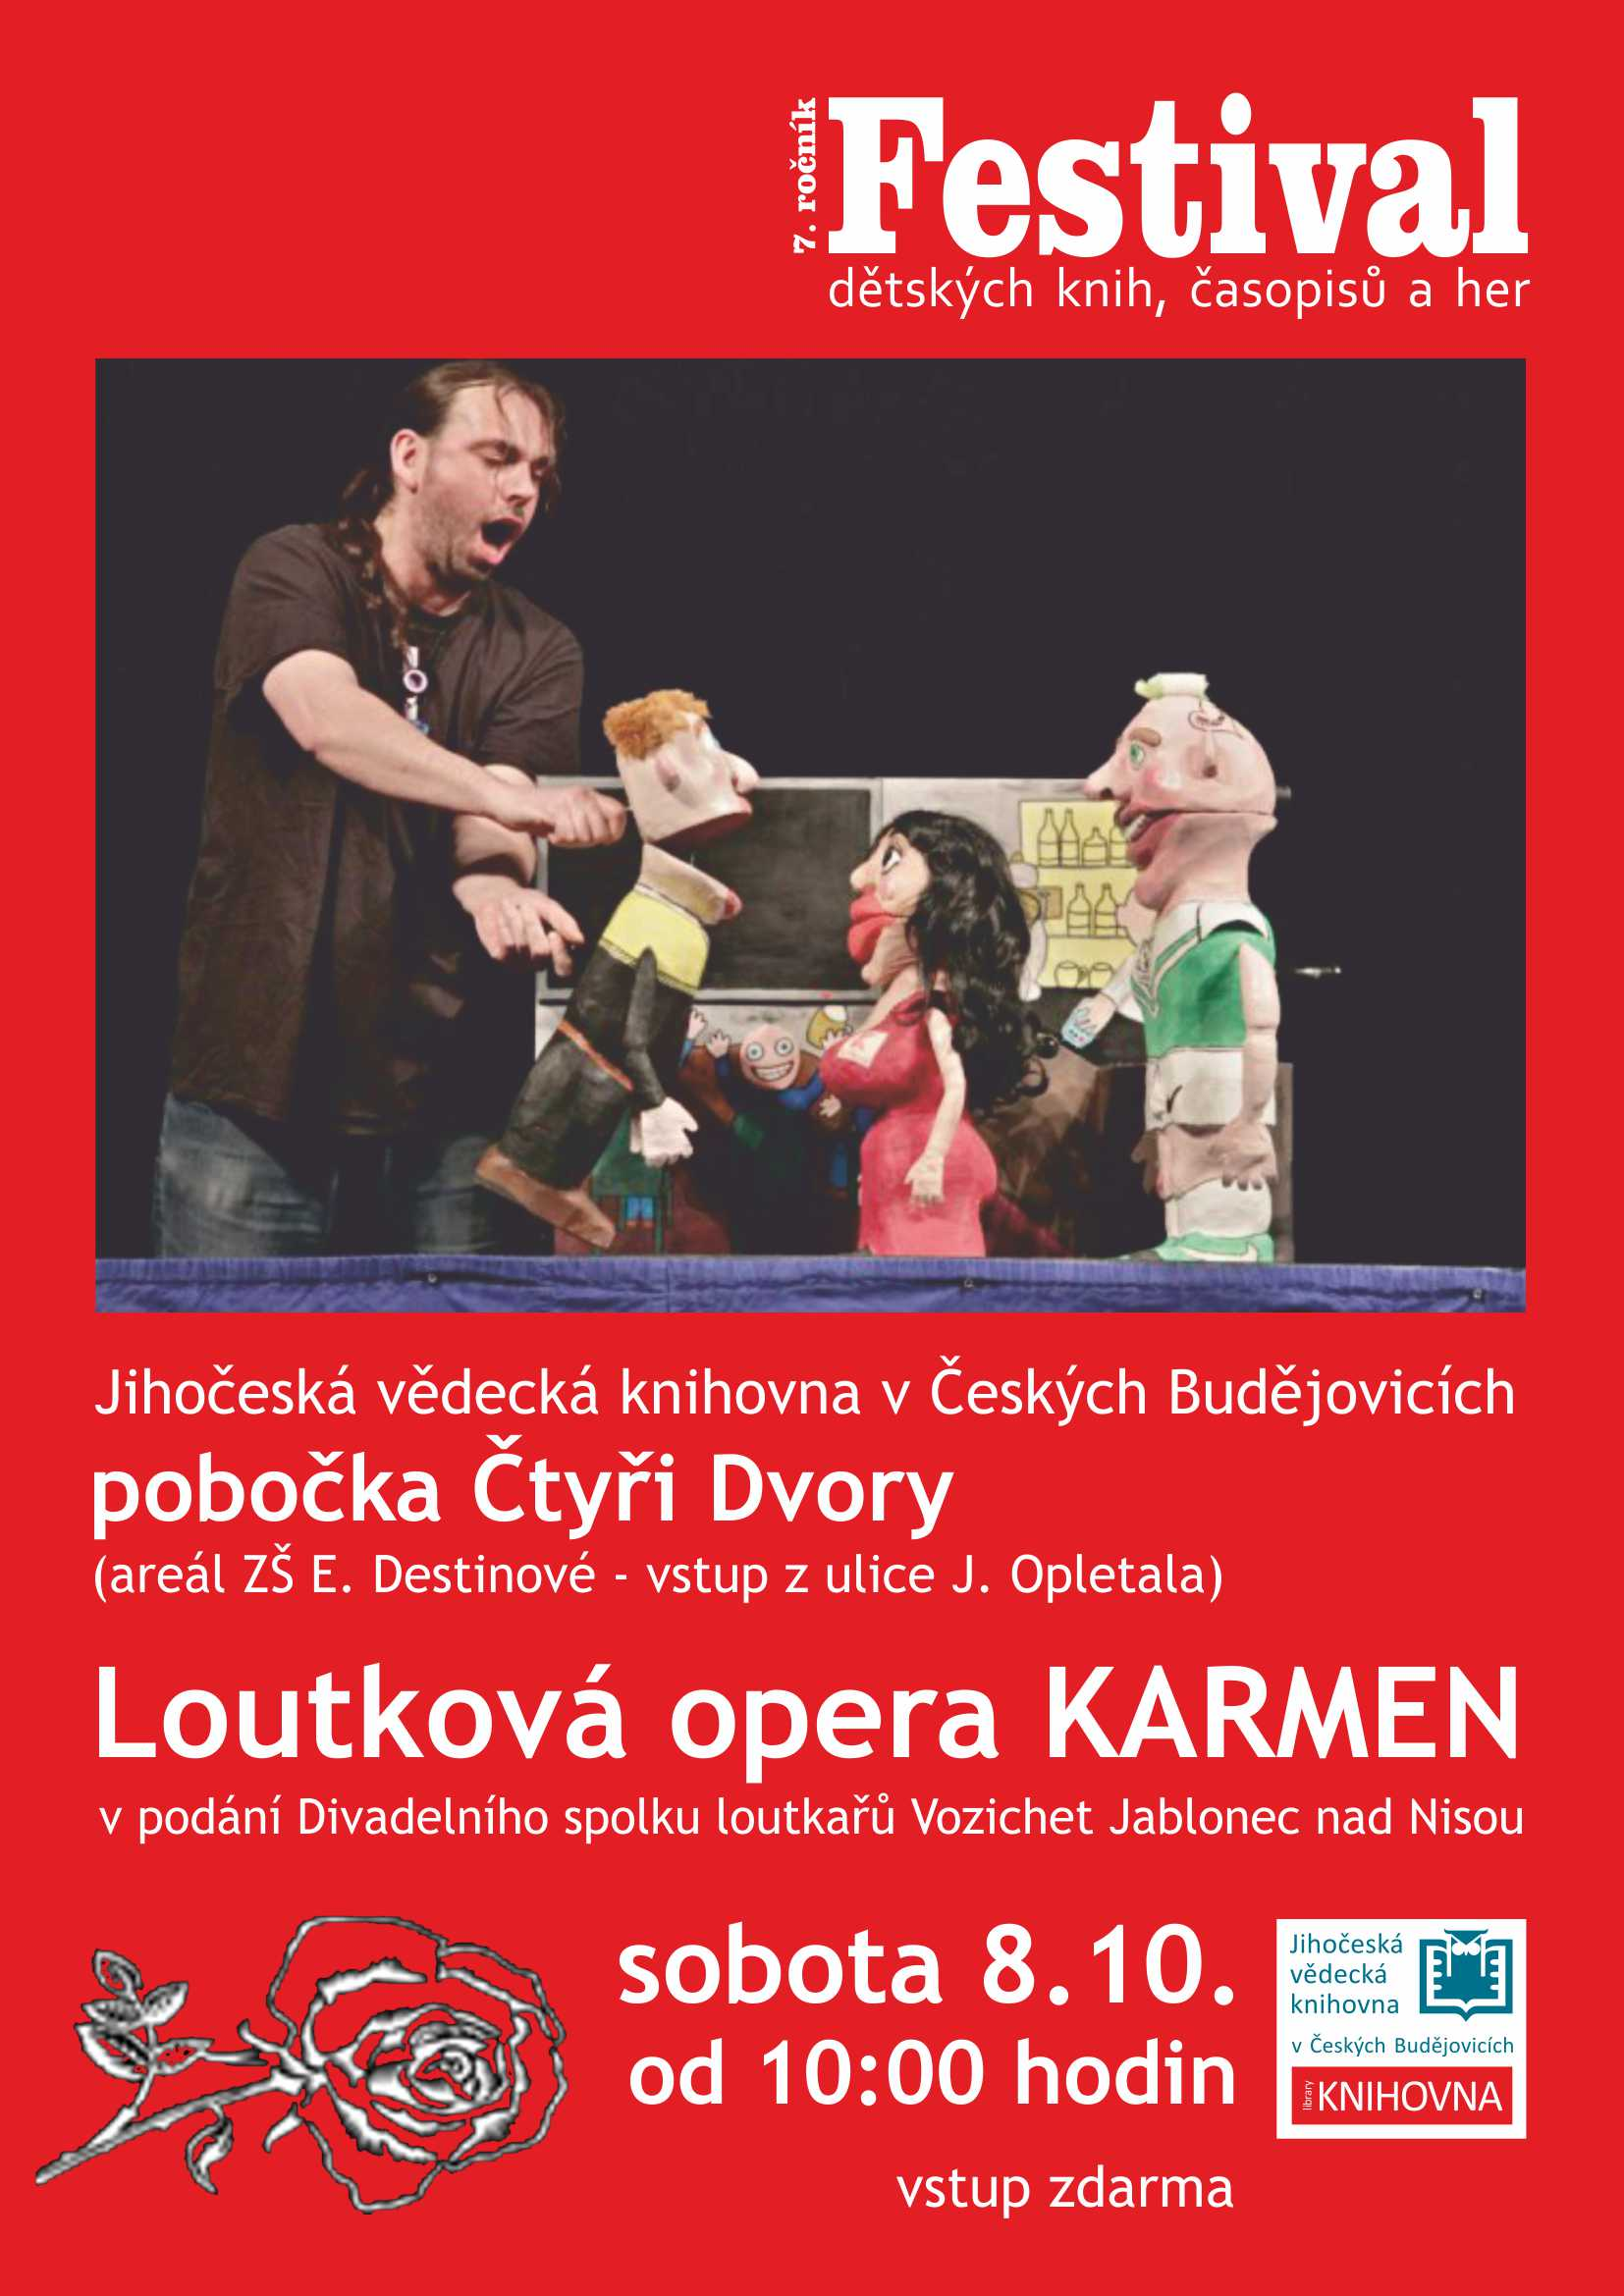 loutkova_opera_karmen_str_1